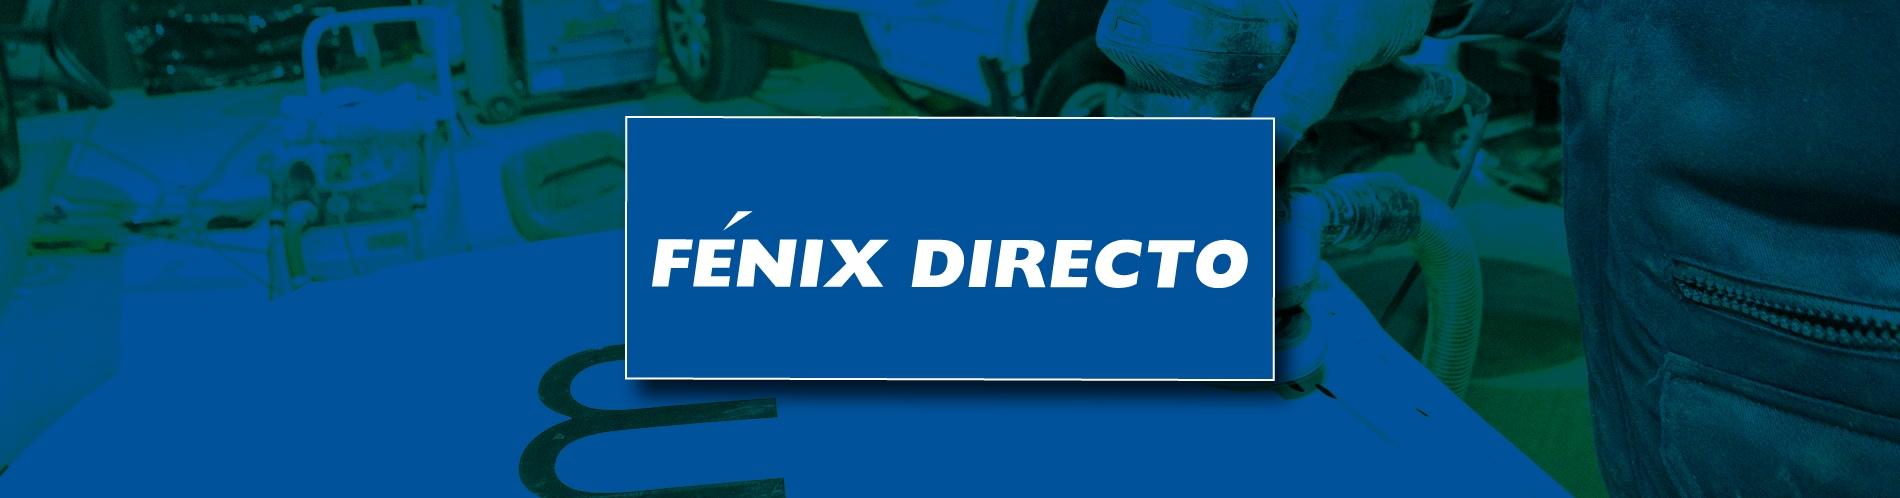 Talleres de chapa y pintura FENIX DIRECTO - Palma de Mallorca